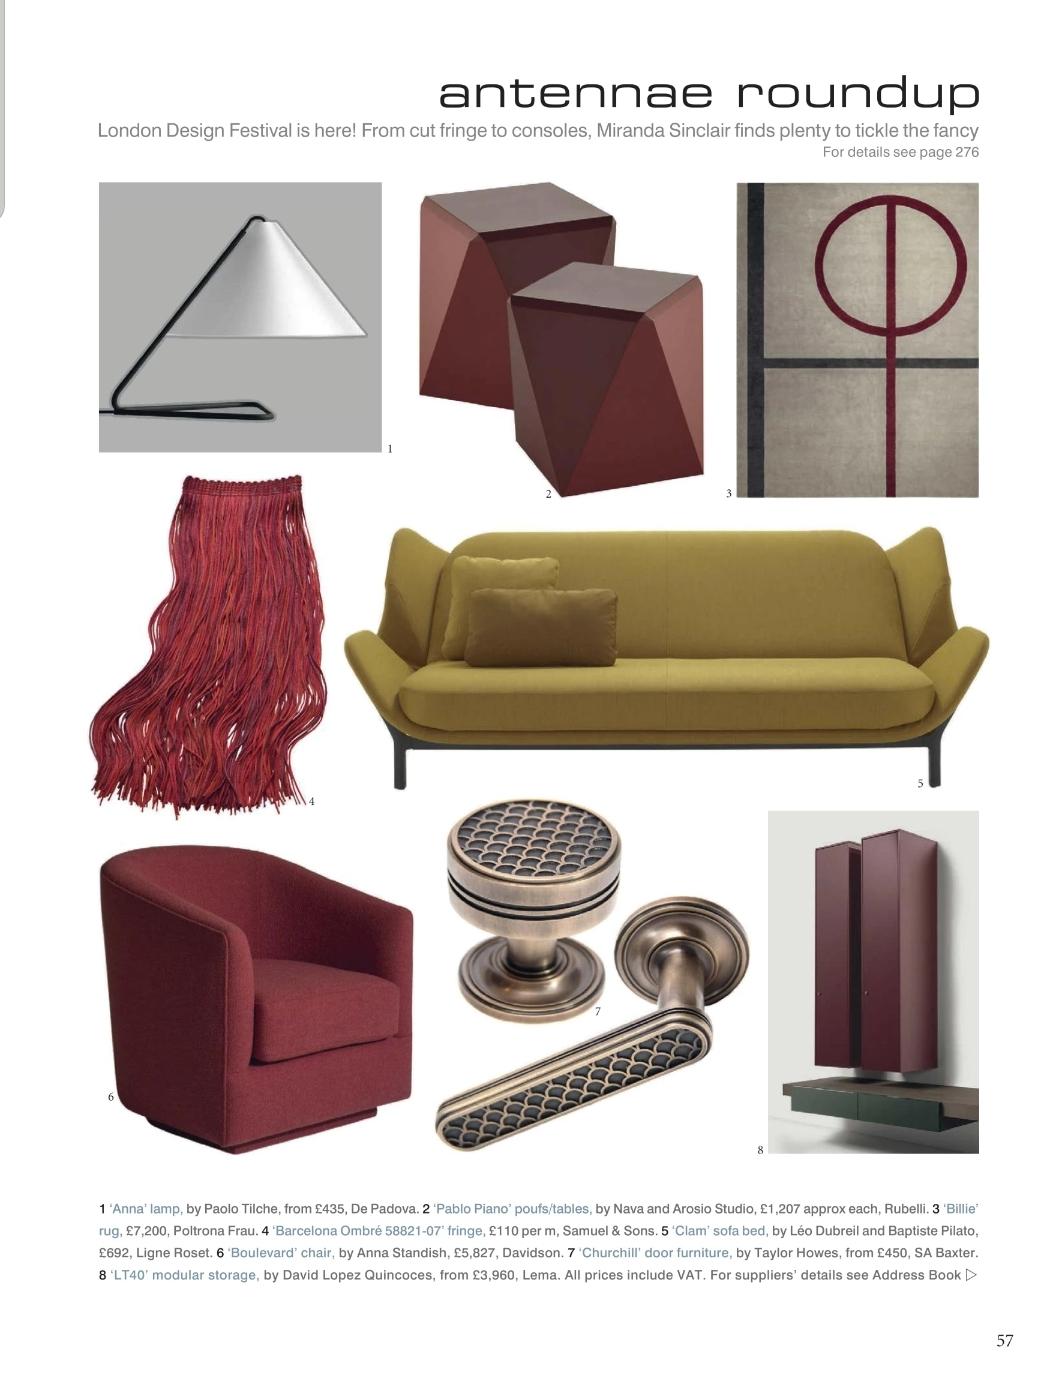 Boulevard Arm Chair - DAVIDSON LONDON designed by ANNA STANDISH